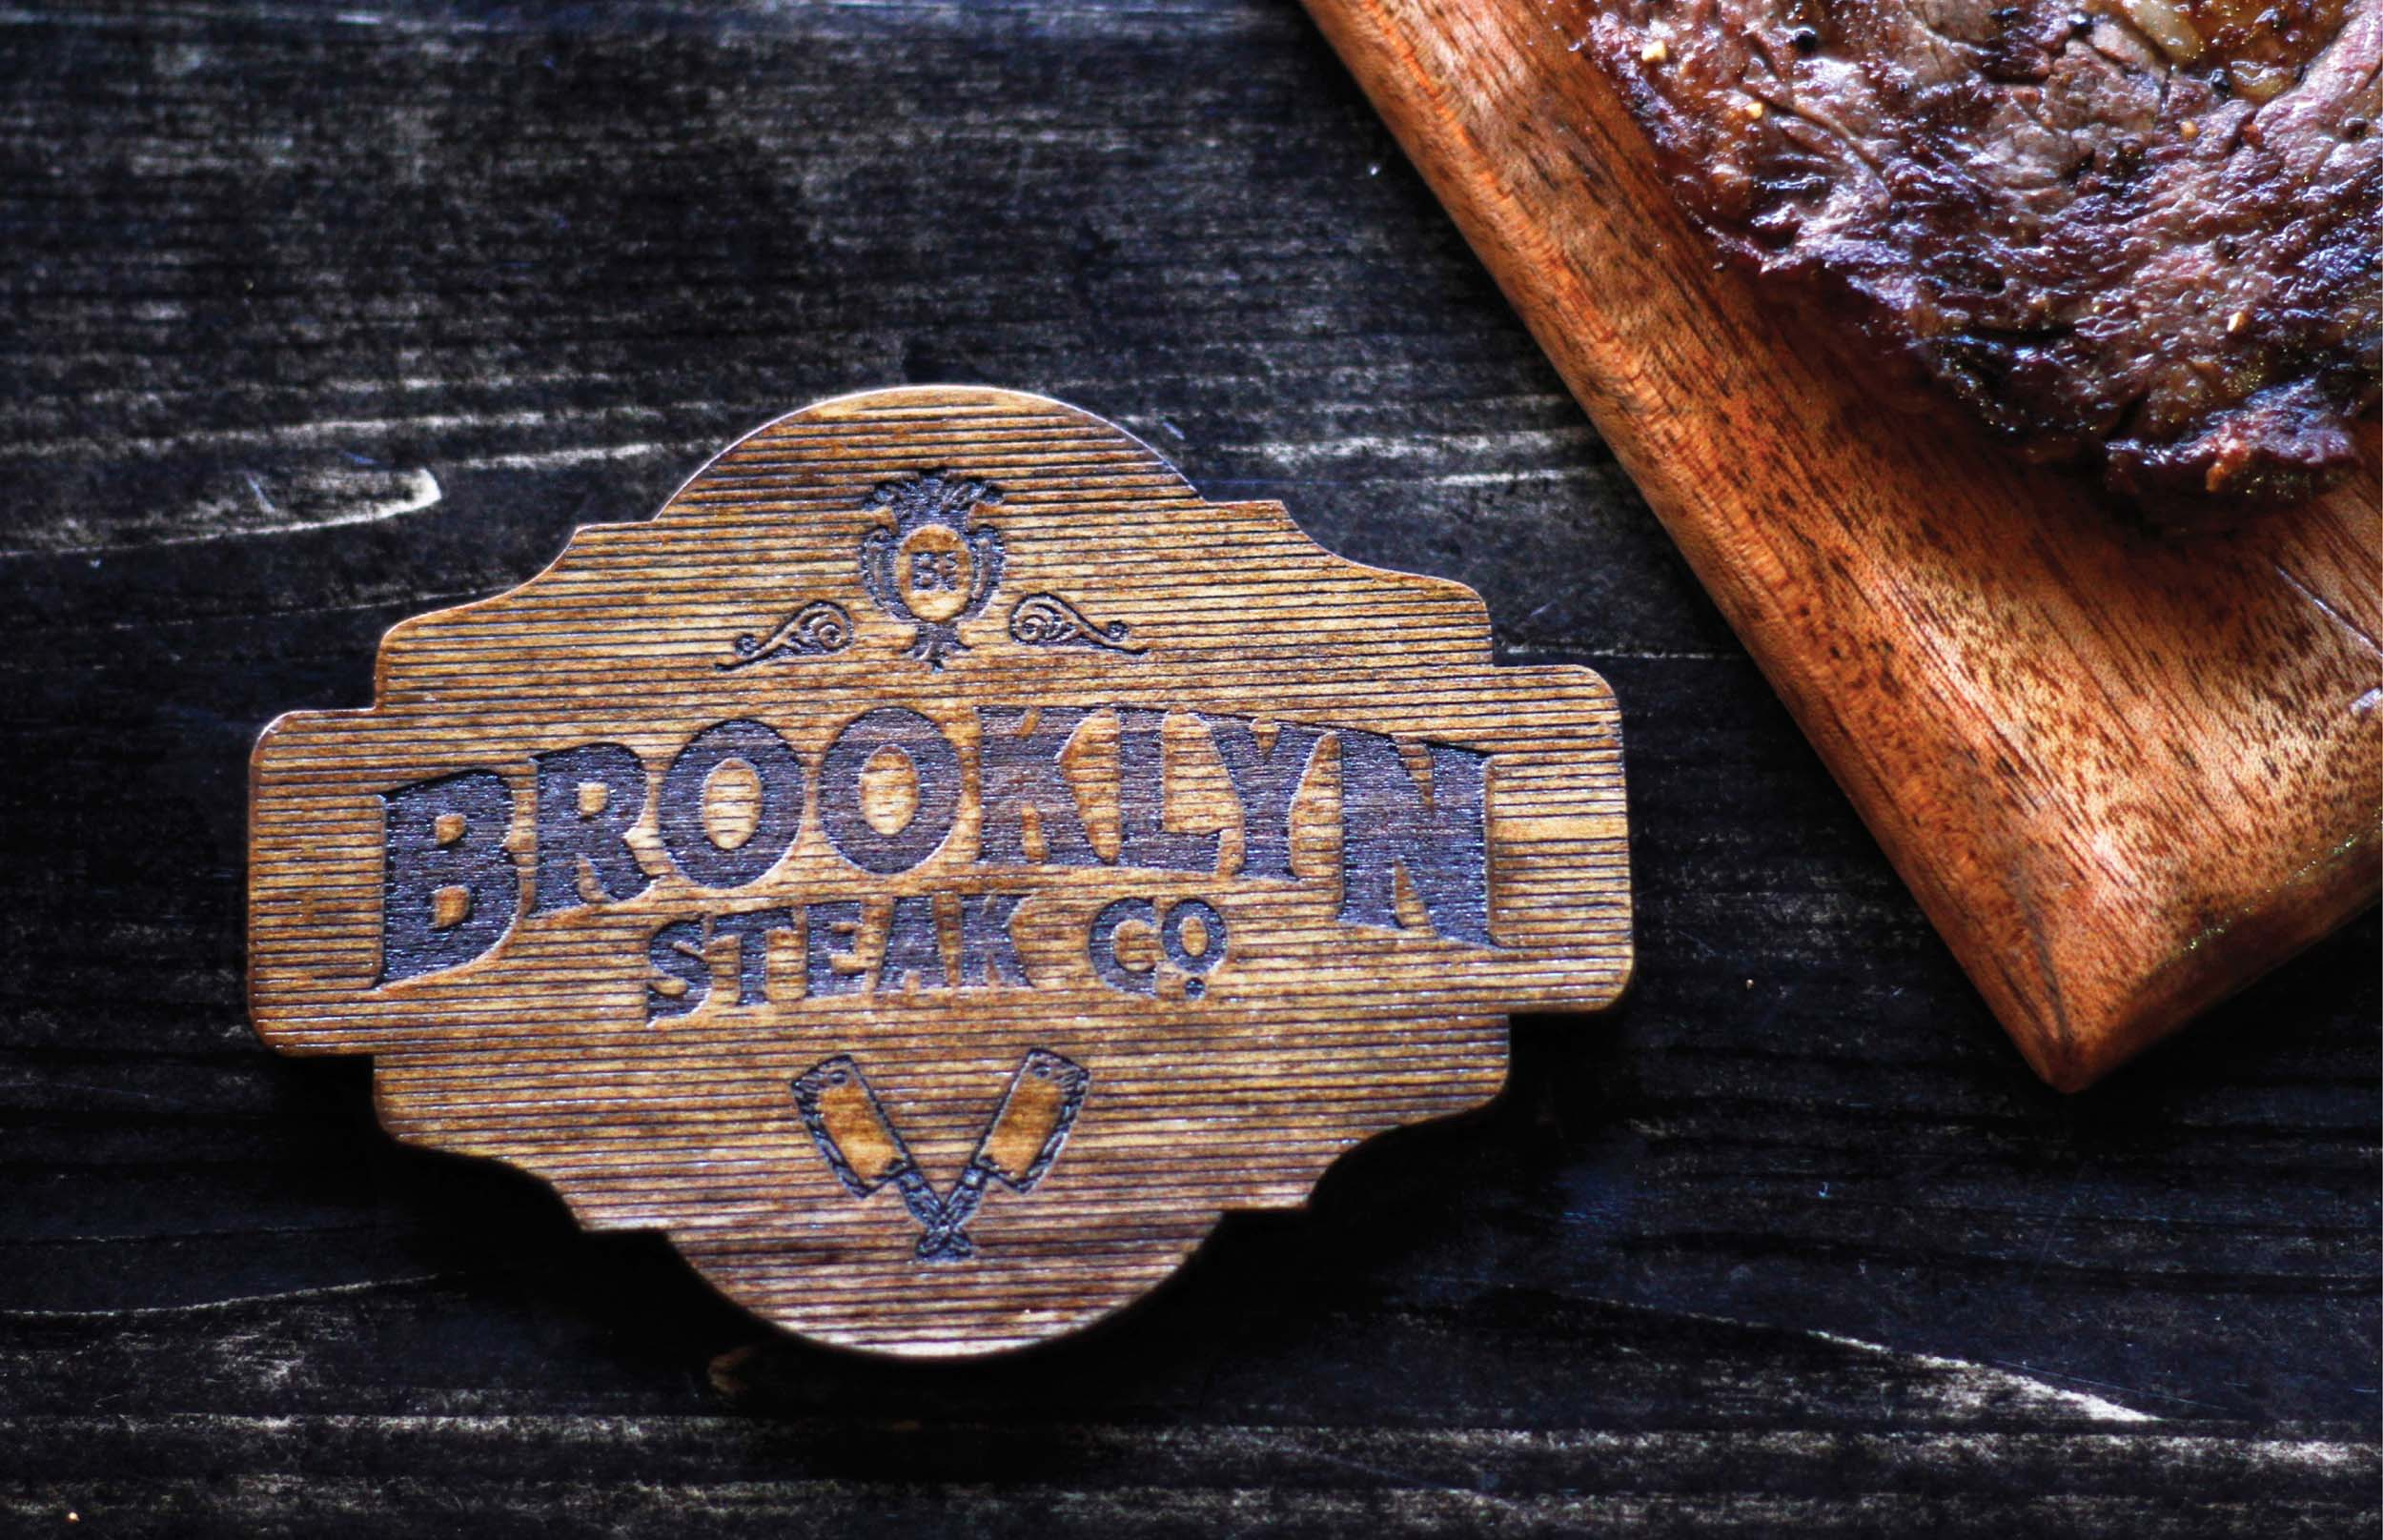 BrooklynSteakCo_1.jpg